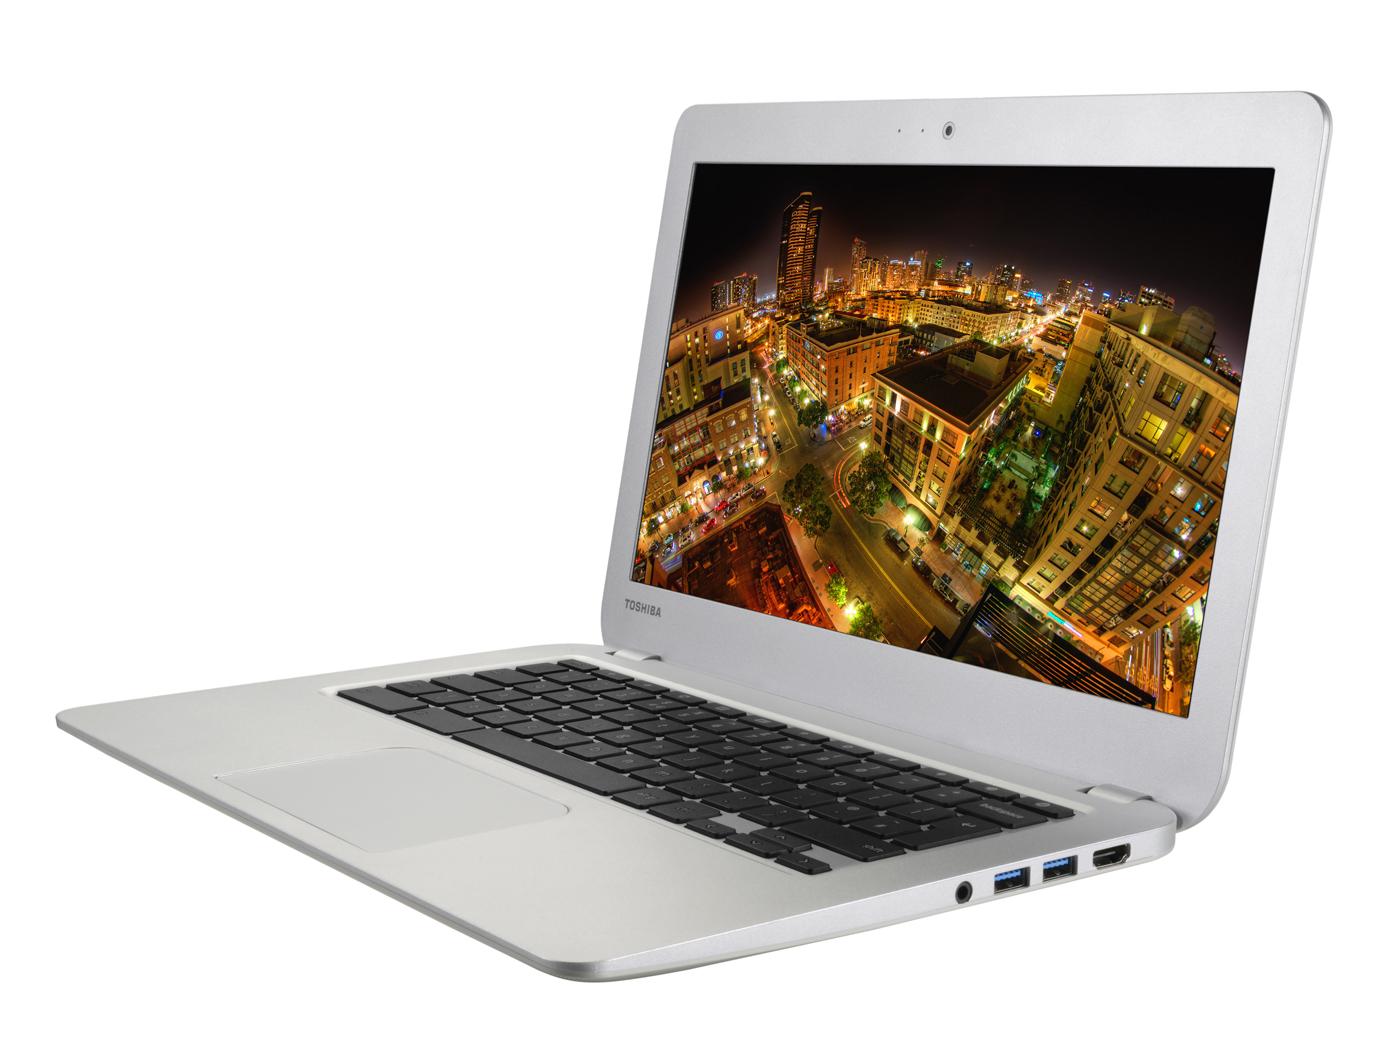 Обзор Toshiba Chromebook CB30 - Notebookcheck-ru.com